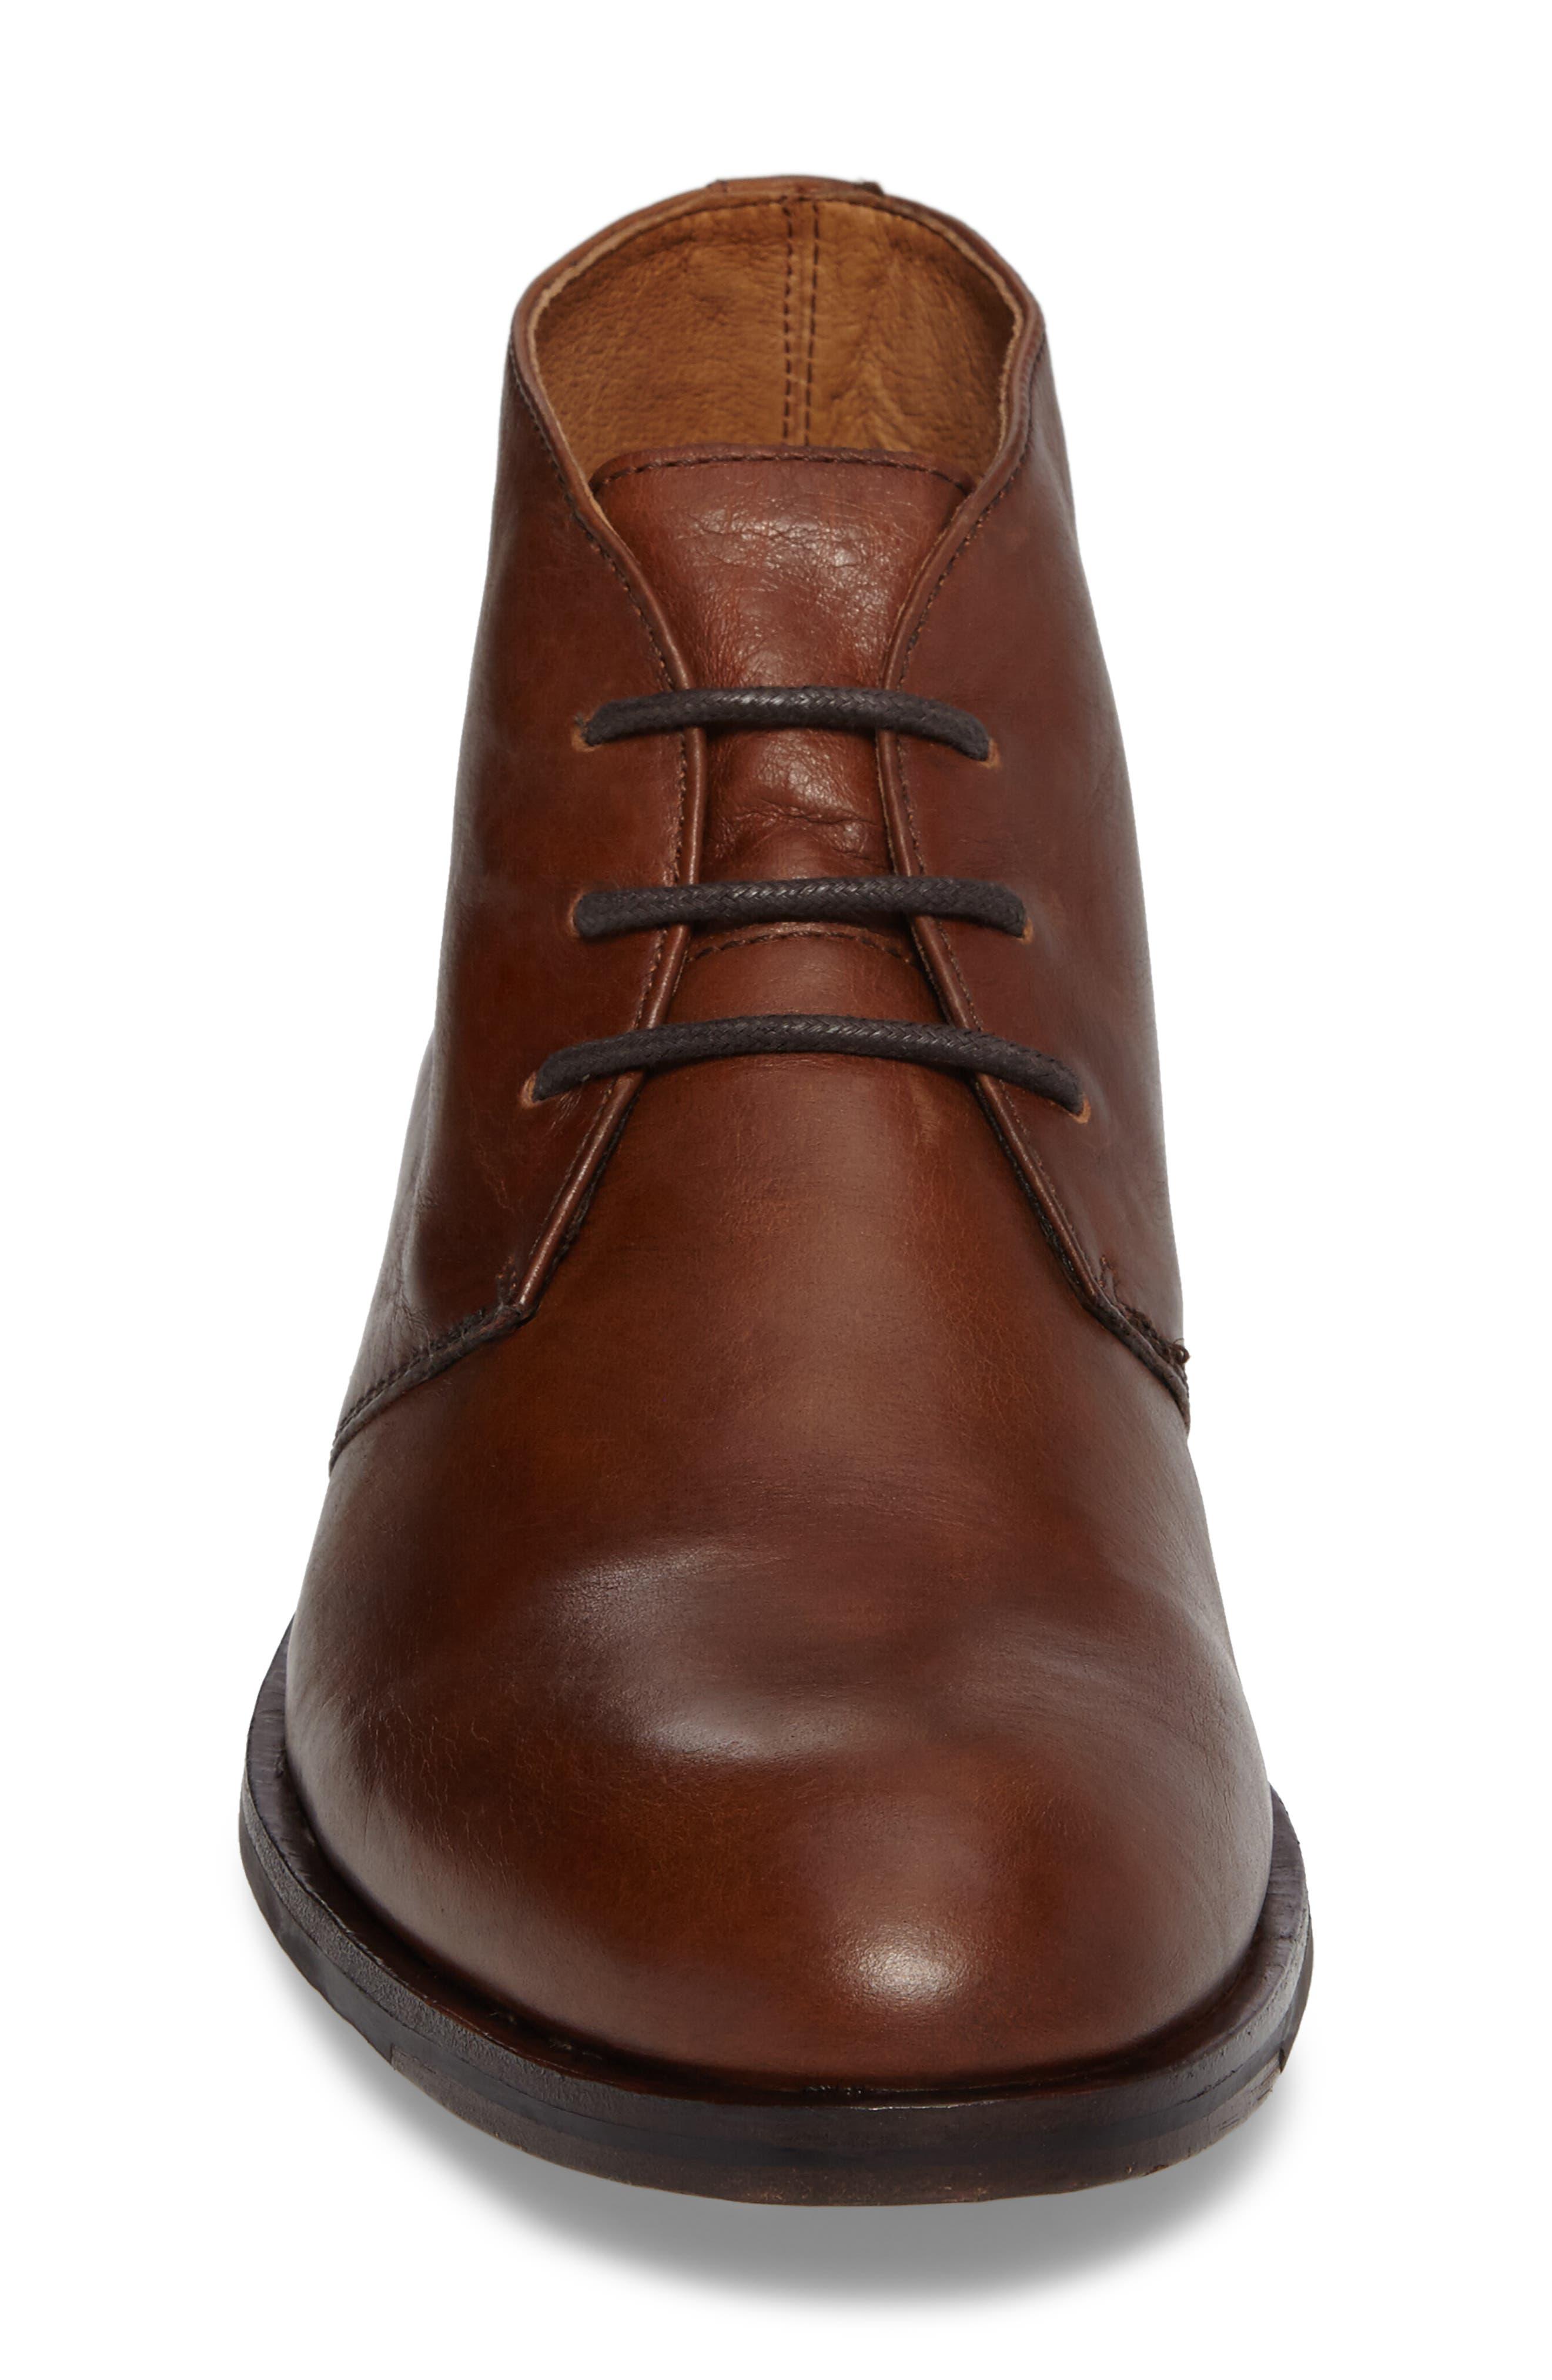 Sam Chukka Boot,                             Alternate thumbnail 4, color,                             Cognac Leather